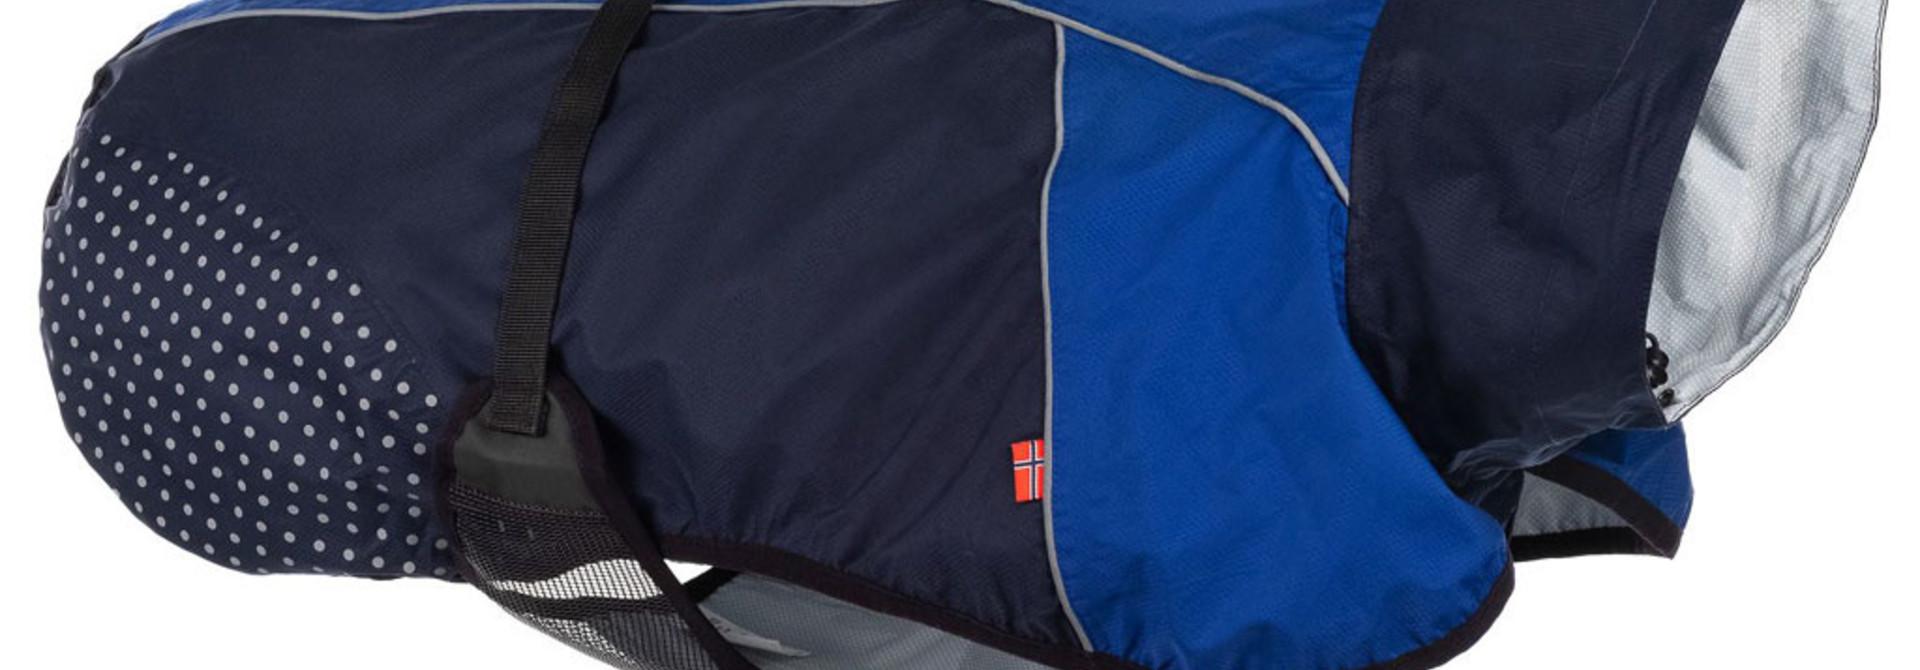 Non-stop Beta Pro Raincoat